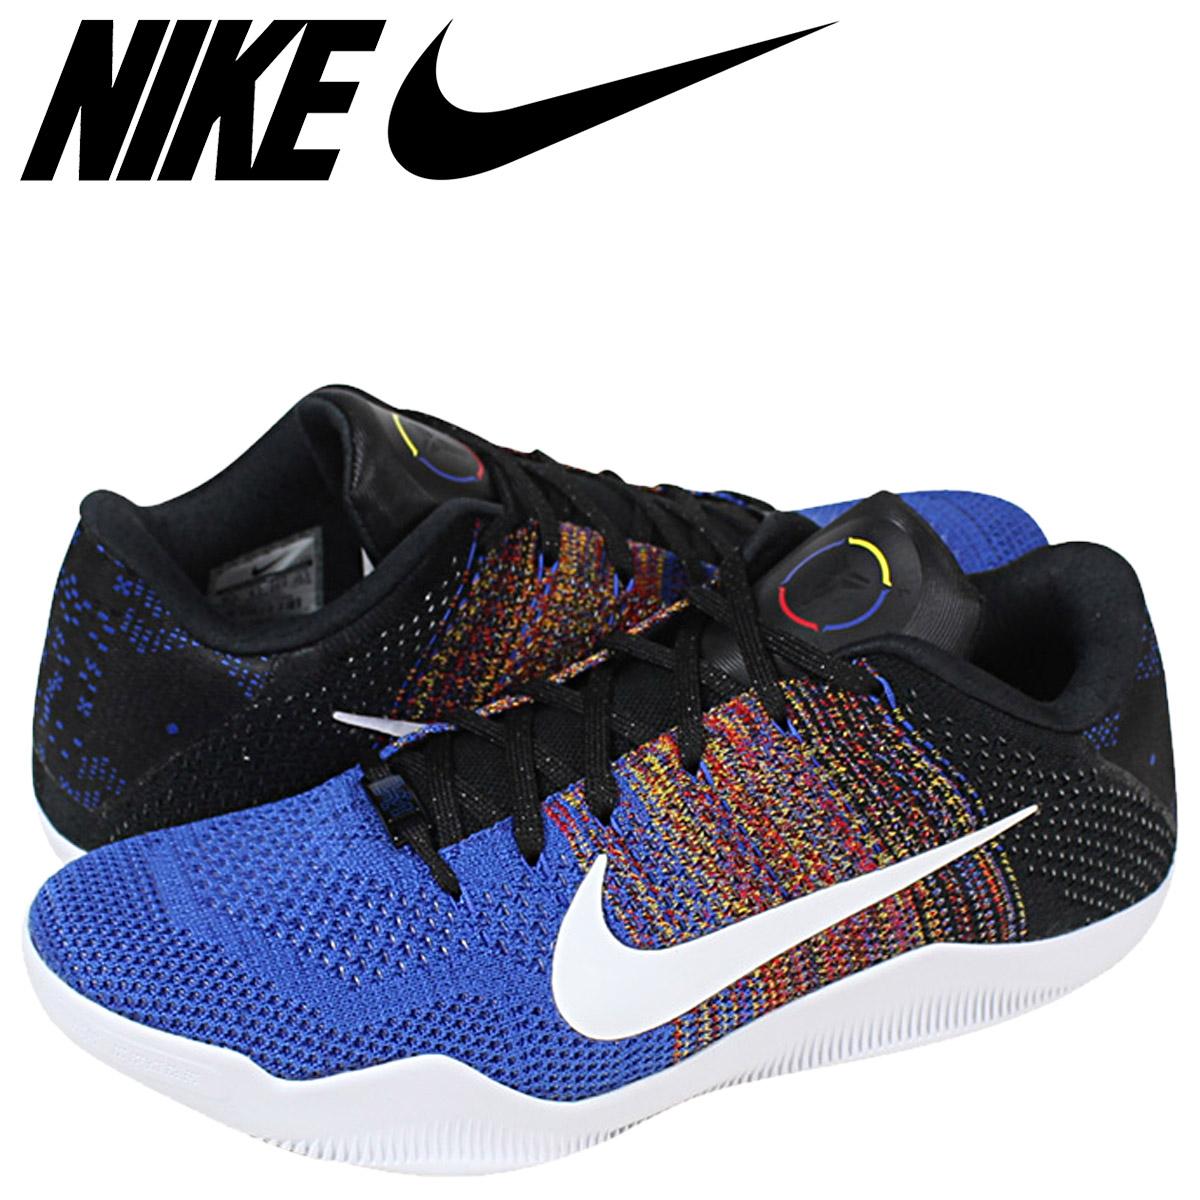 best sneakers 6bc71 18eb6 NIKE Nike Corby sneakers KOBE 11 ELITE LOW BHM 822,522-914 blue men   ...